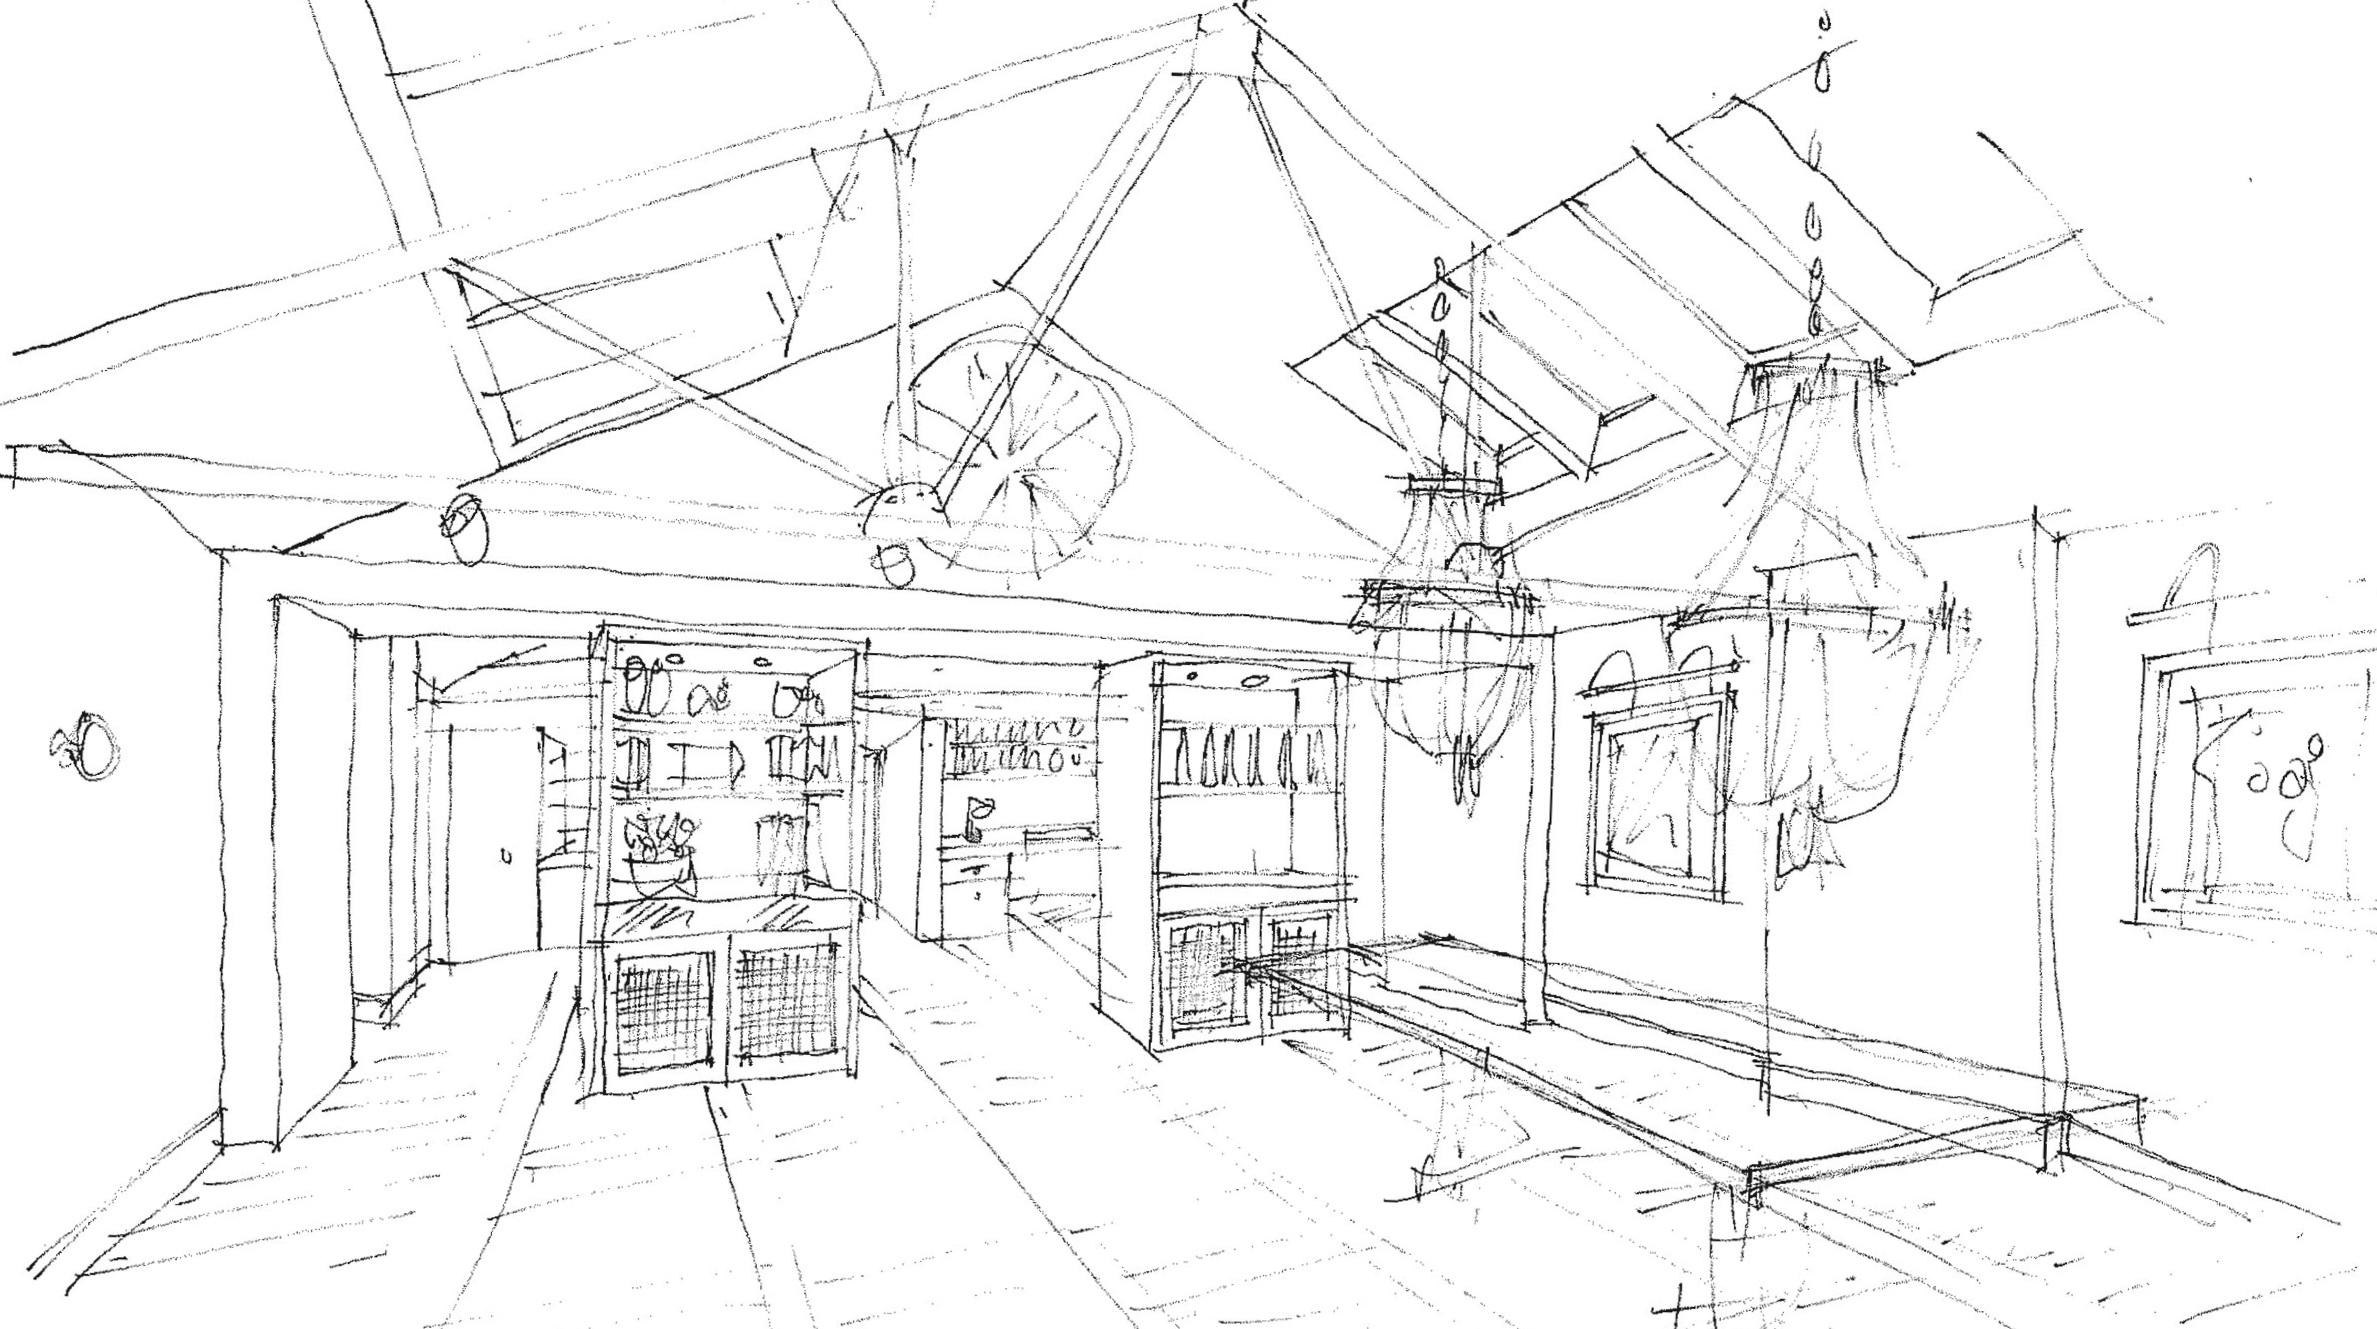 TBF+Sketch.jpg